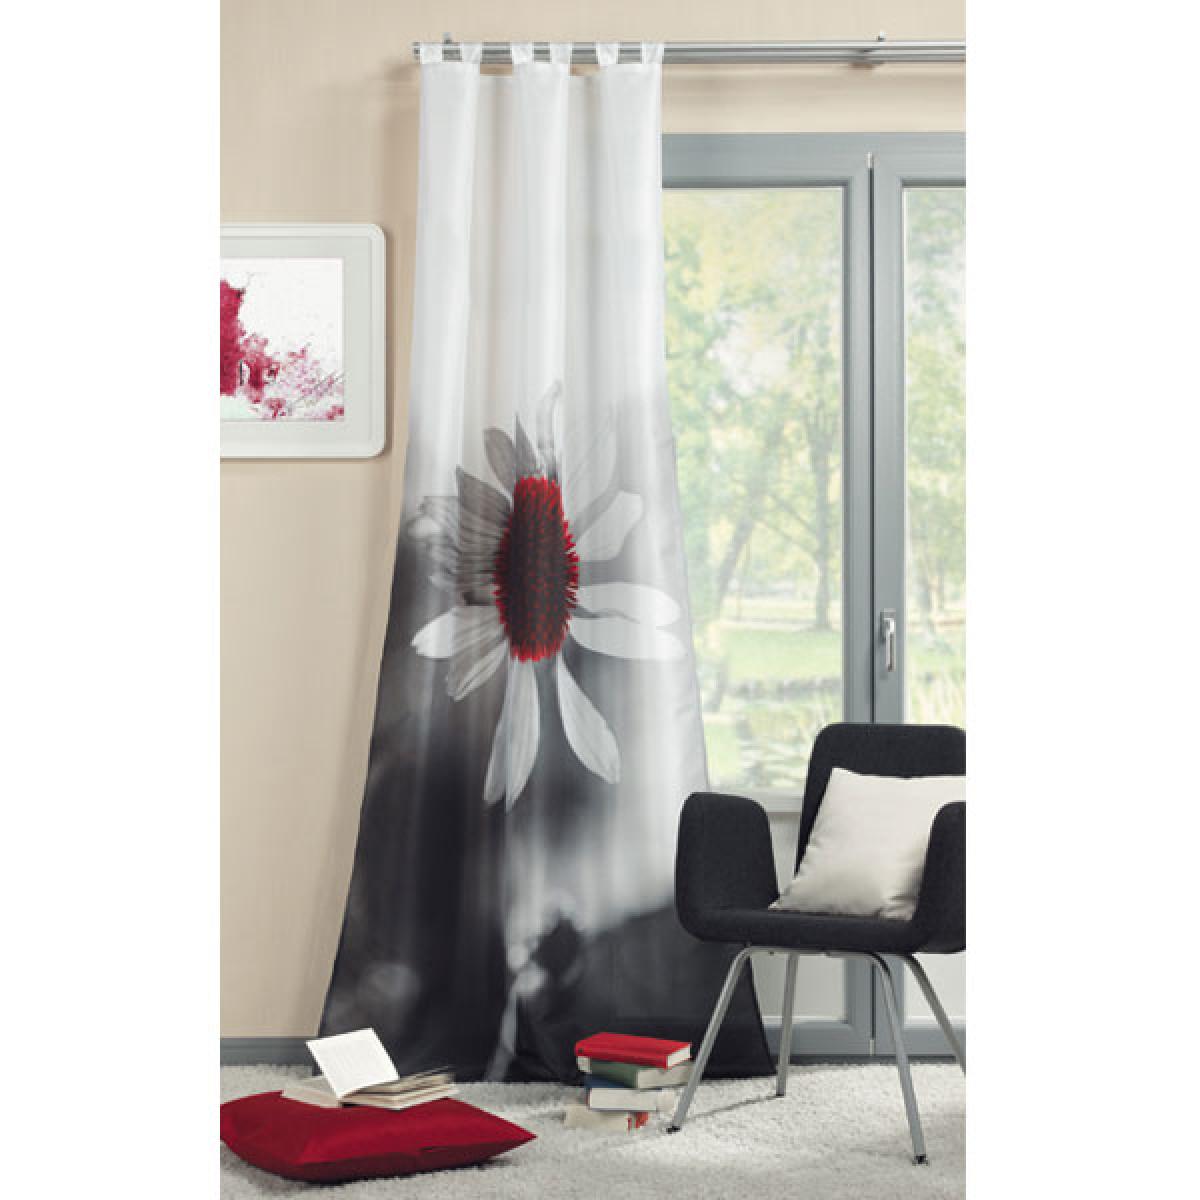 færdigsyede gardiner Færdigsyede gardiner med digitaltryk   Toulon 48319 896   (BxH  færdigsyede gardiner